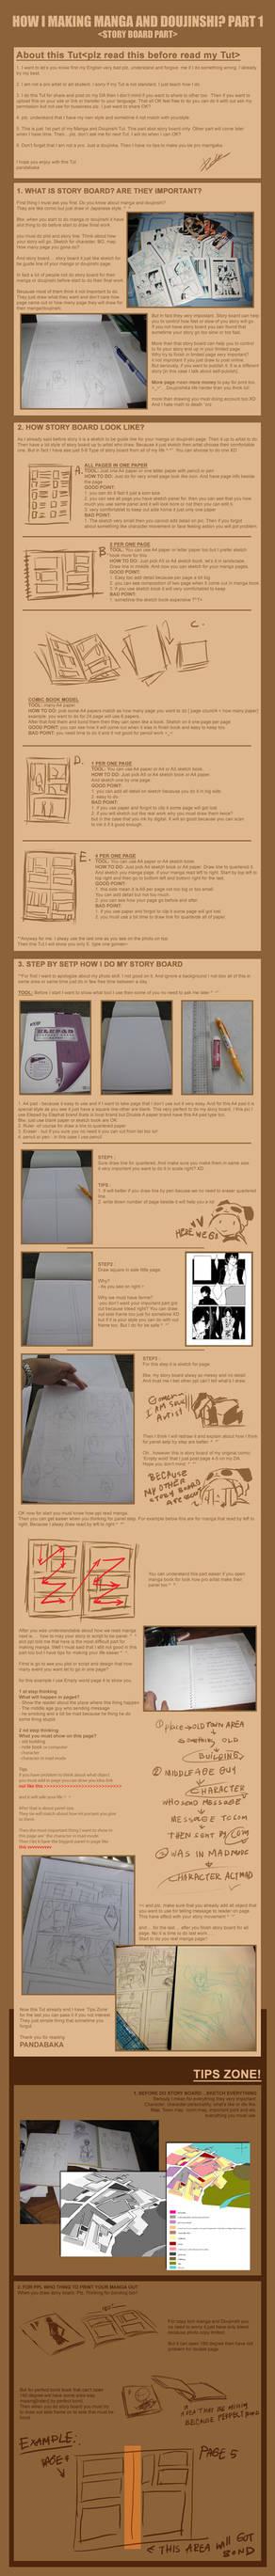 How I making manga part 1